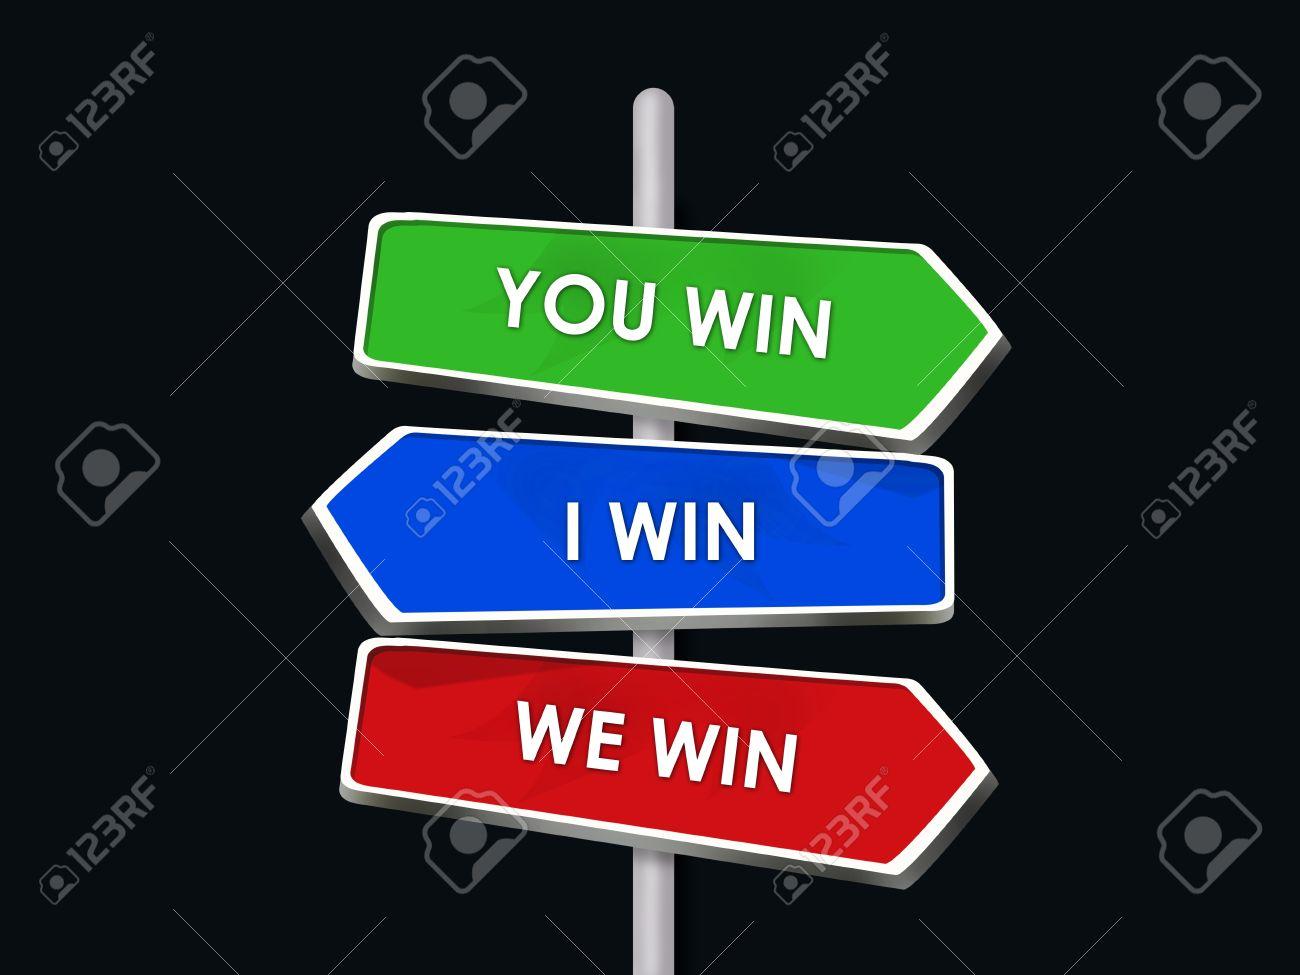 Risultati immagini per all winners